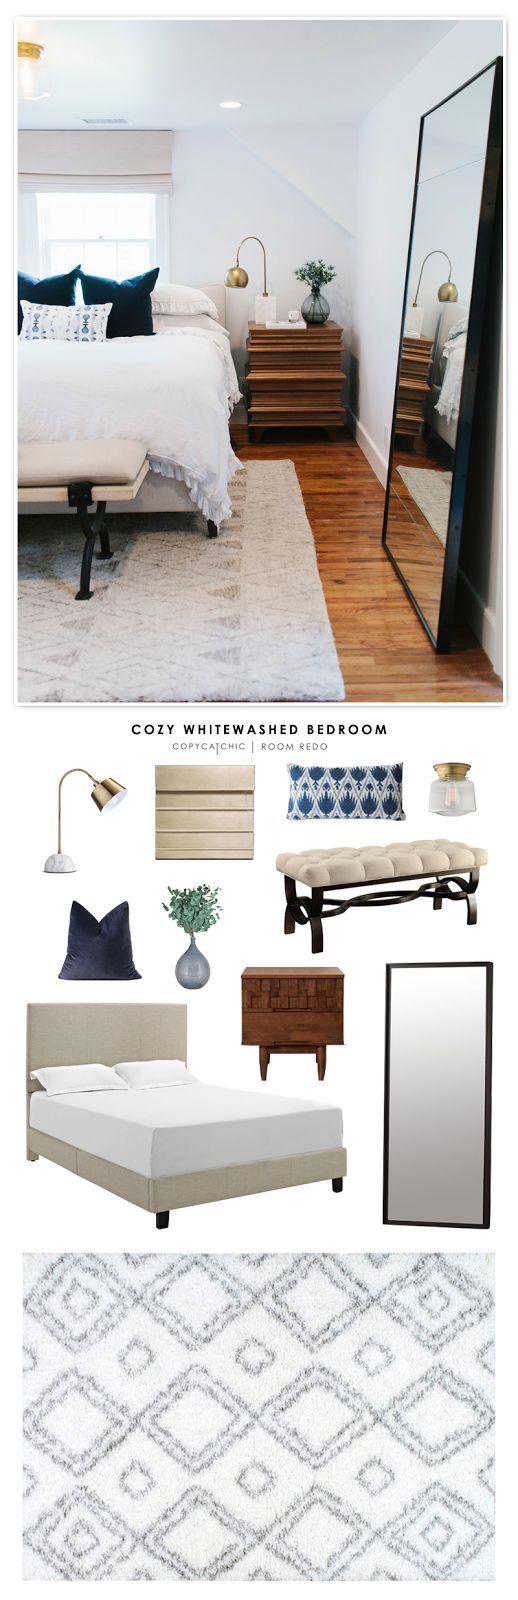 cat bedroom. Copy Cat Chic Room Redo Best 25  bedroom ideas on Pinterest decor things